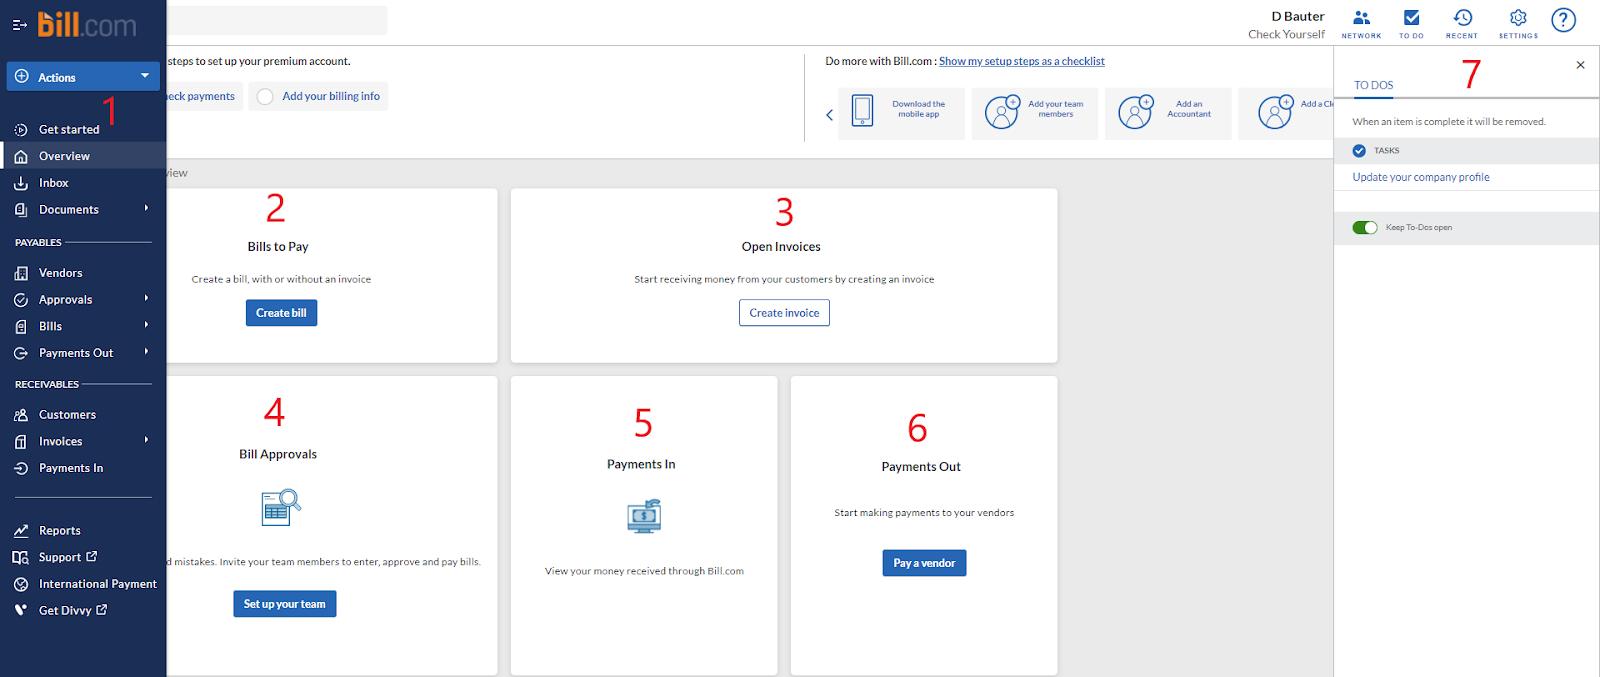 View of Bill.com Dashboard